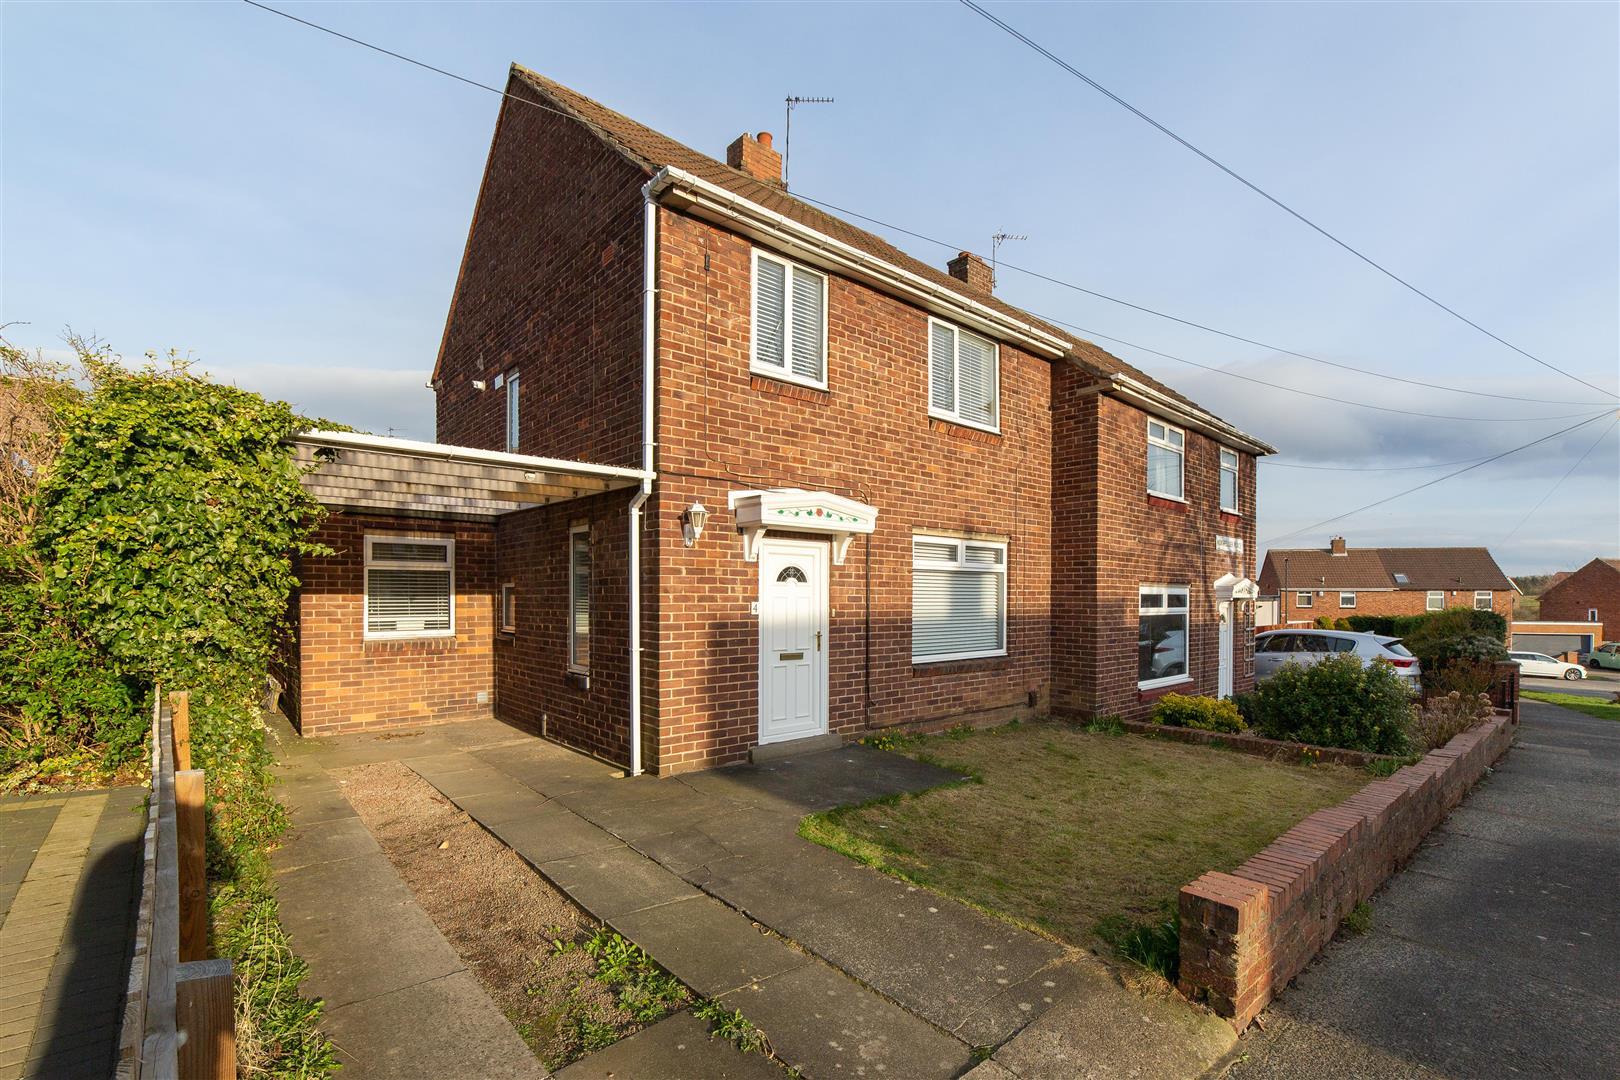 3 bed semi-detached house for sale in Newcastle Upon Tyne, NE3 4TU, NE3